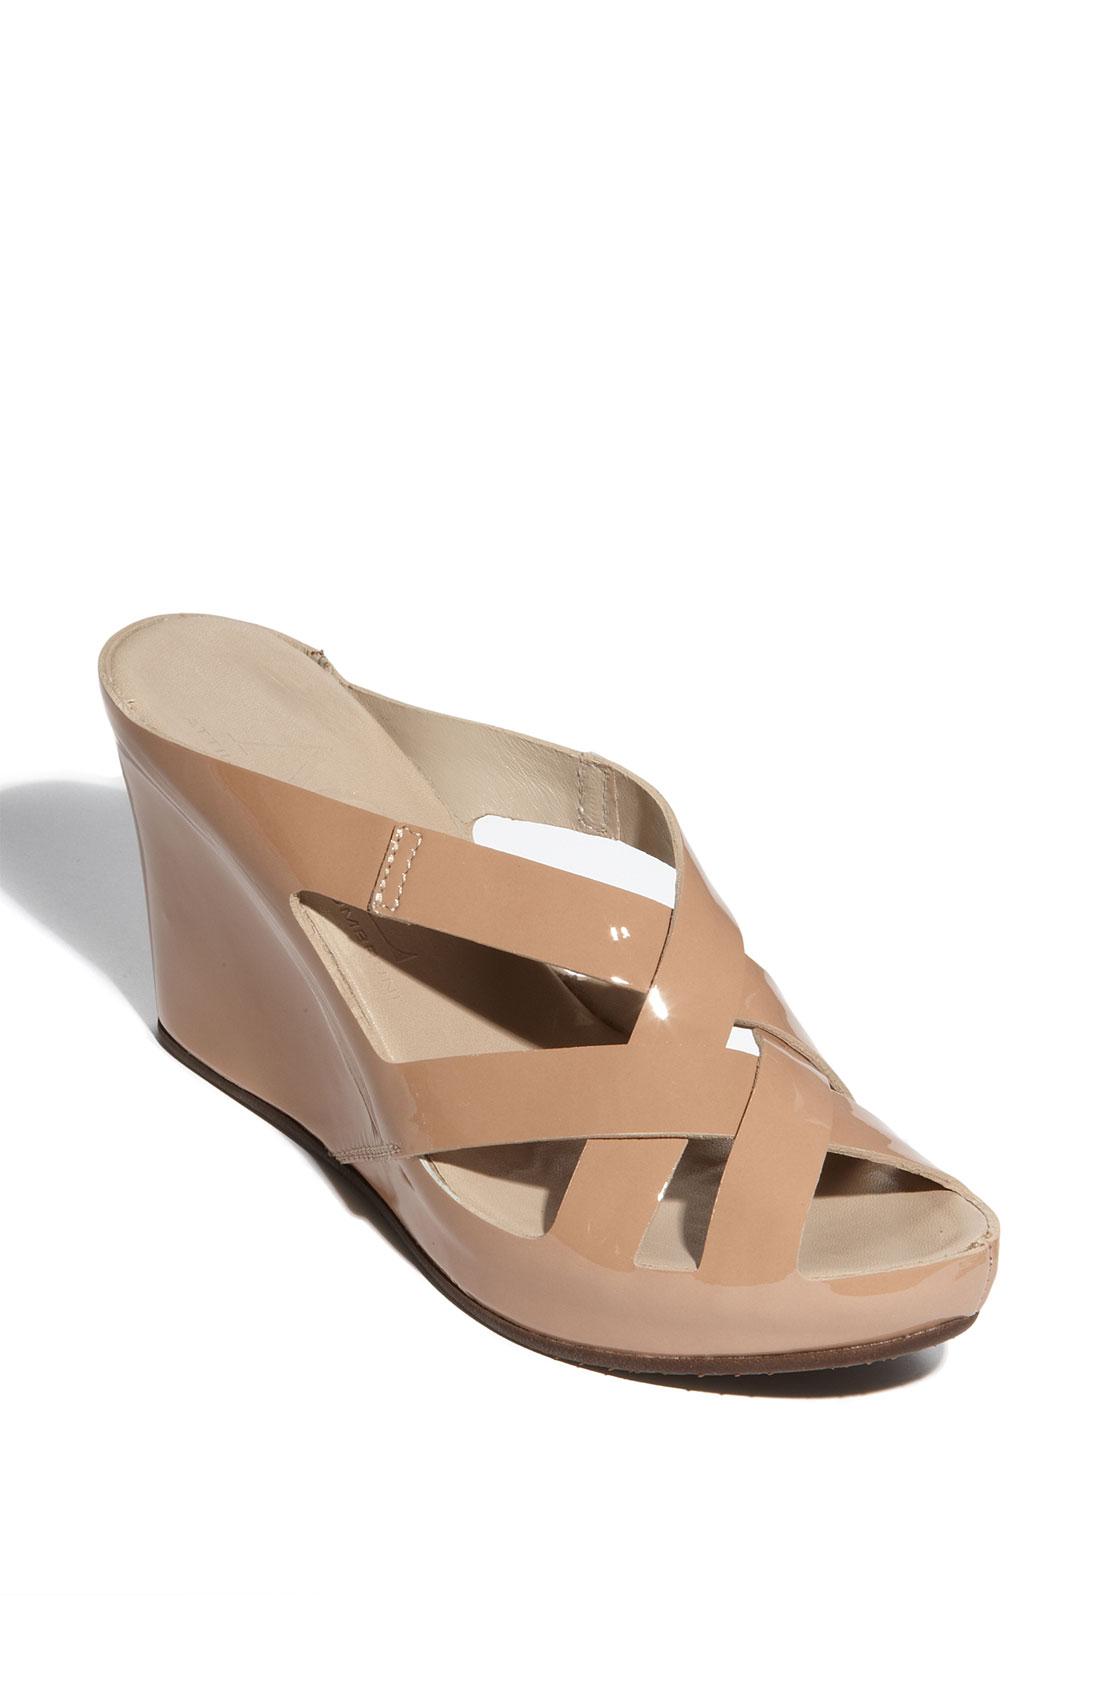 attilio giusti leombruni wedge sandal in beige